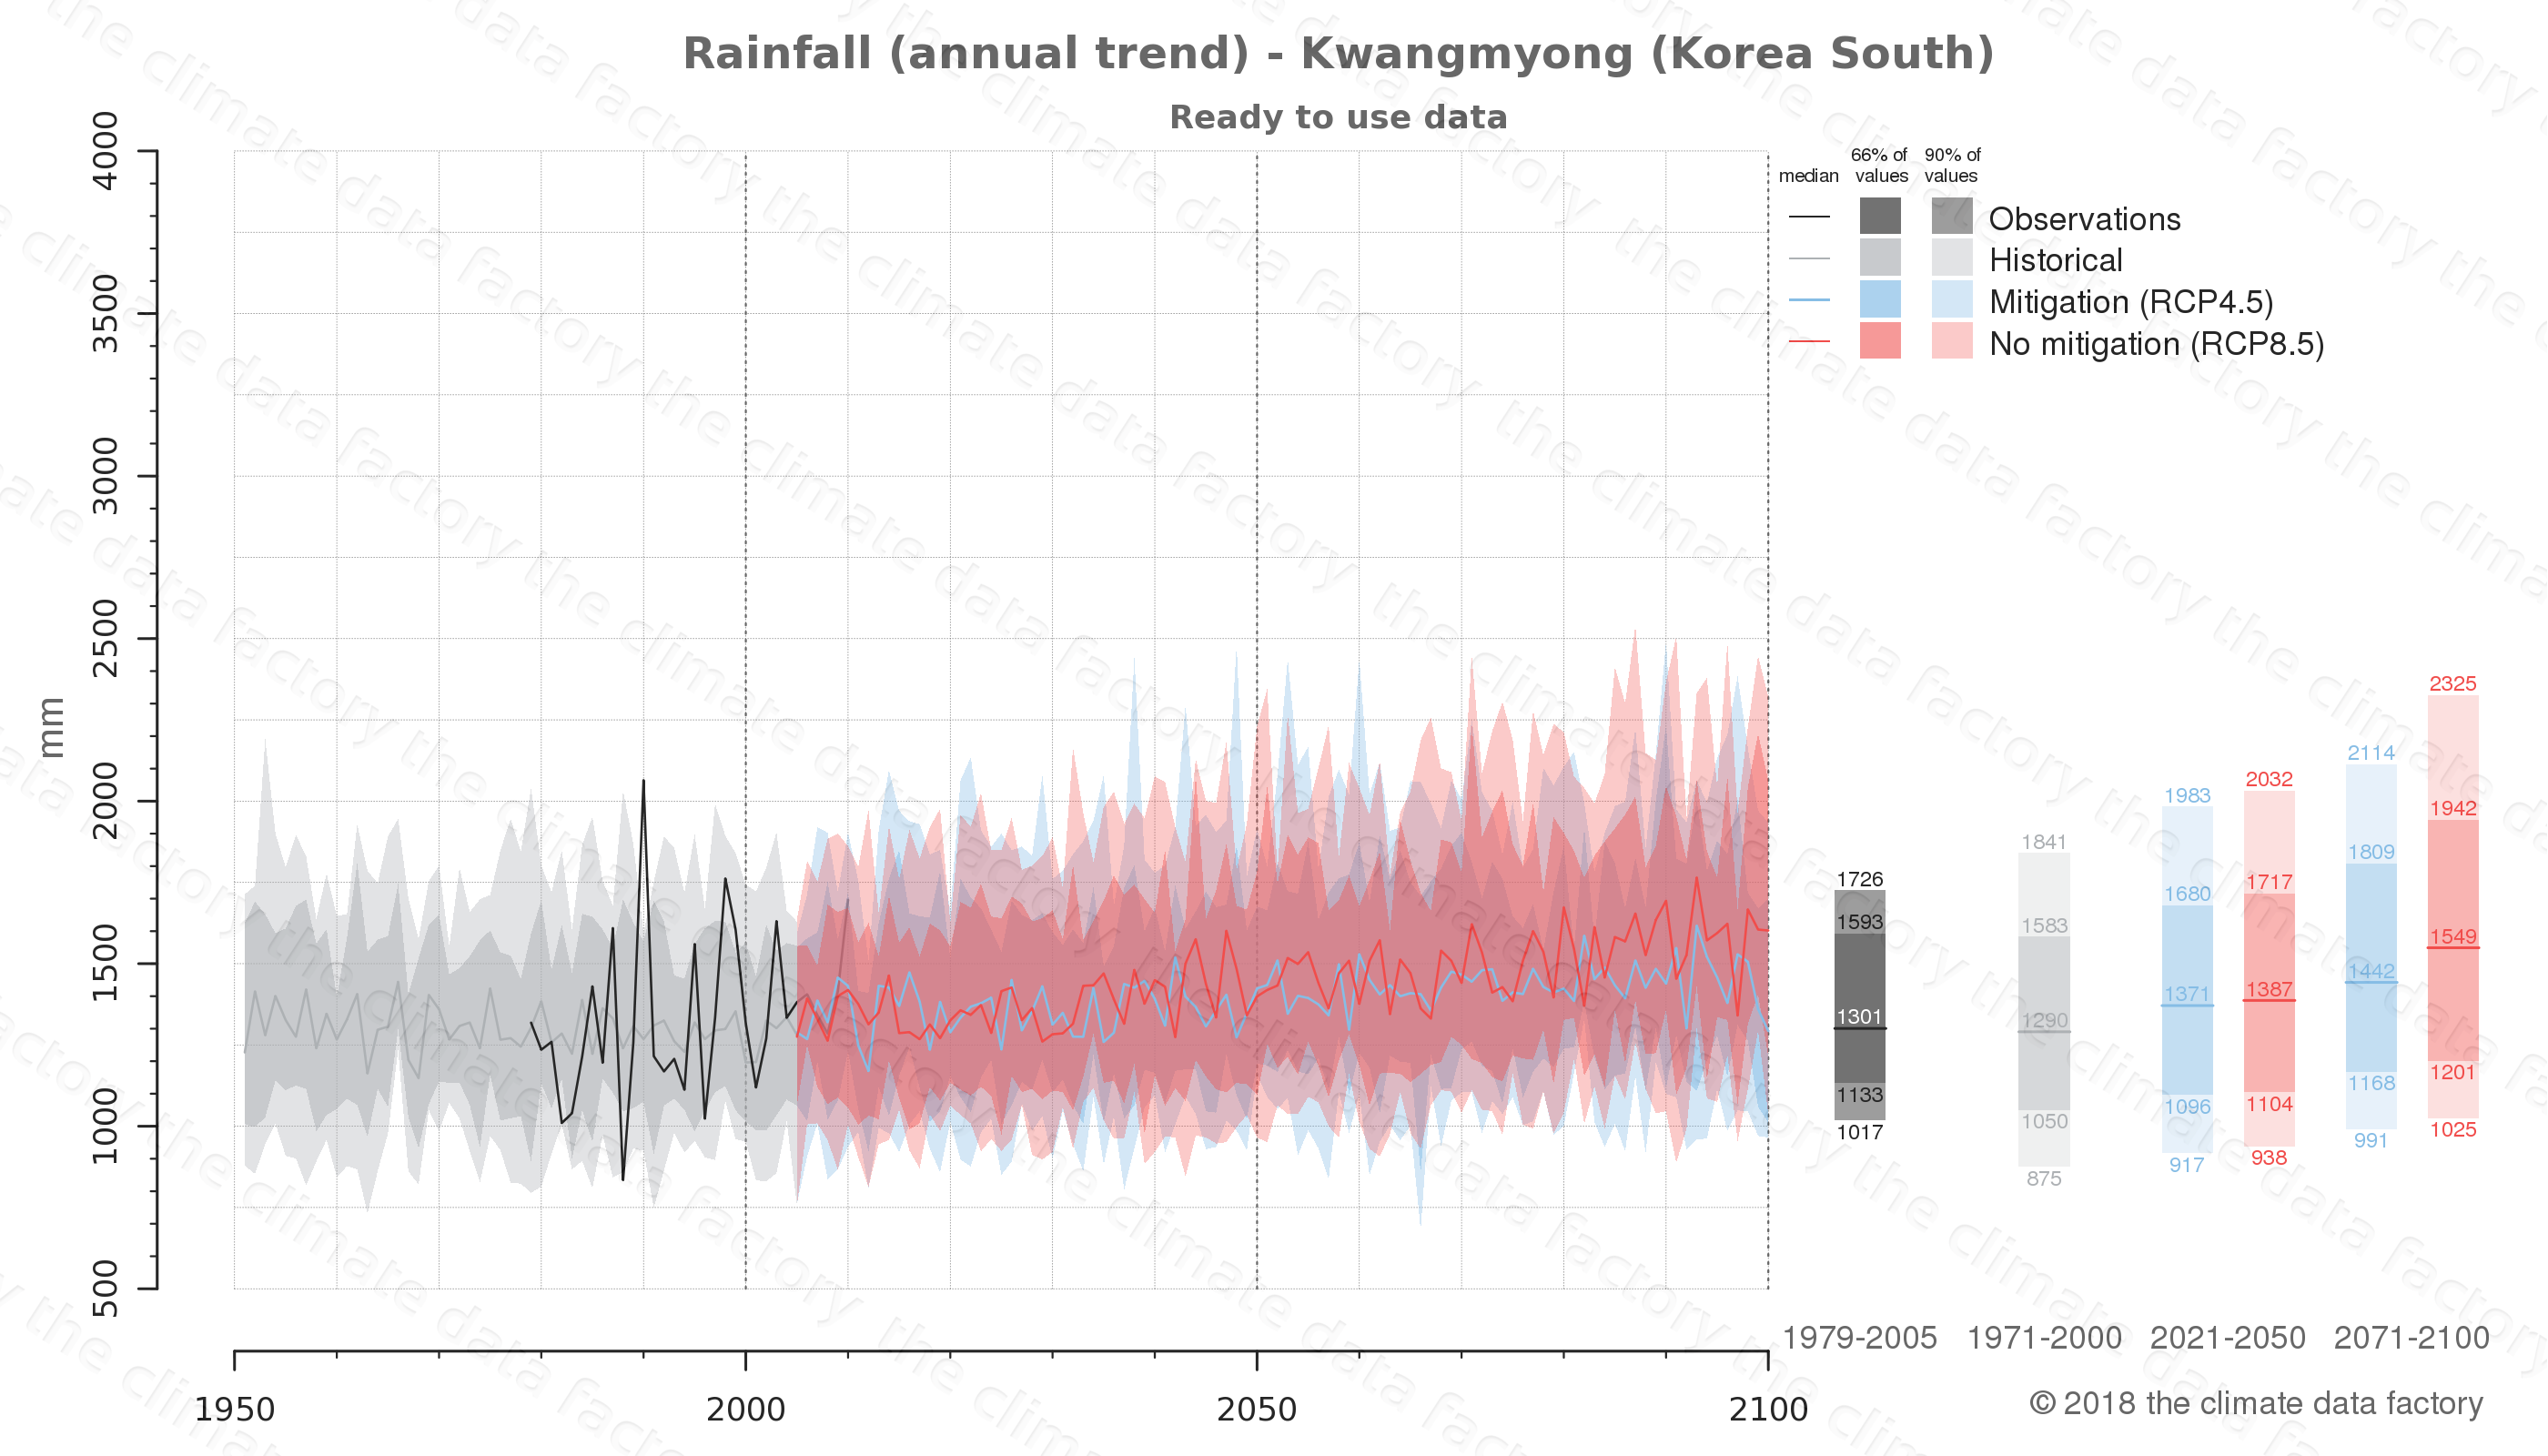 climate change data policy adaptation climate graph city data rainfall kwangmyong south korea